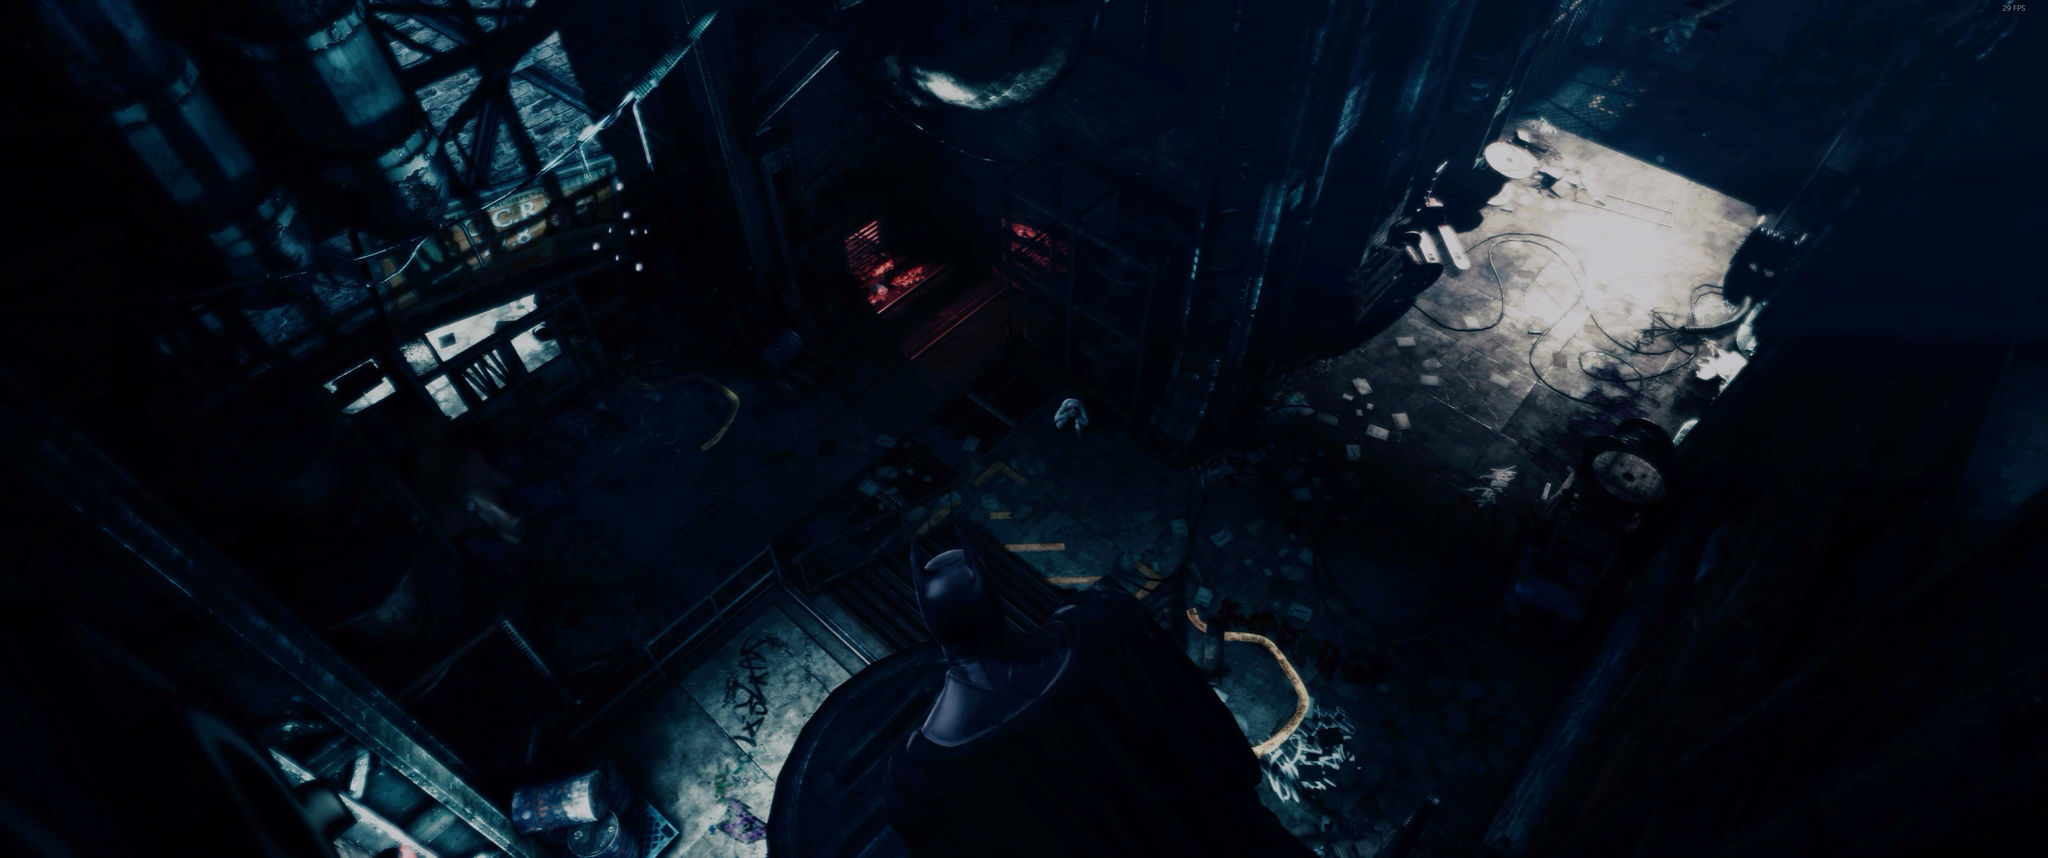 [Contest] Batman Screenshot Contest - September 2016 Batman13